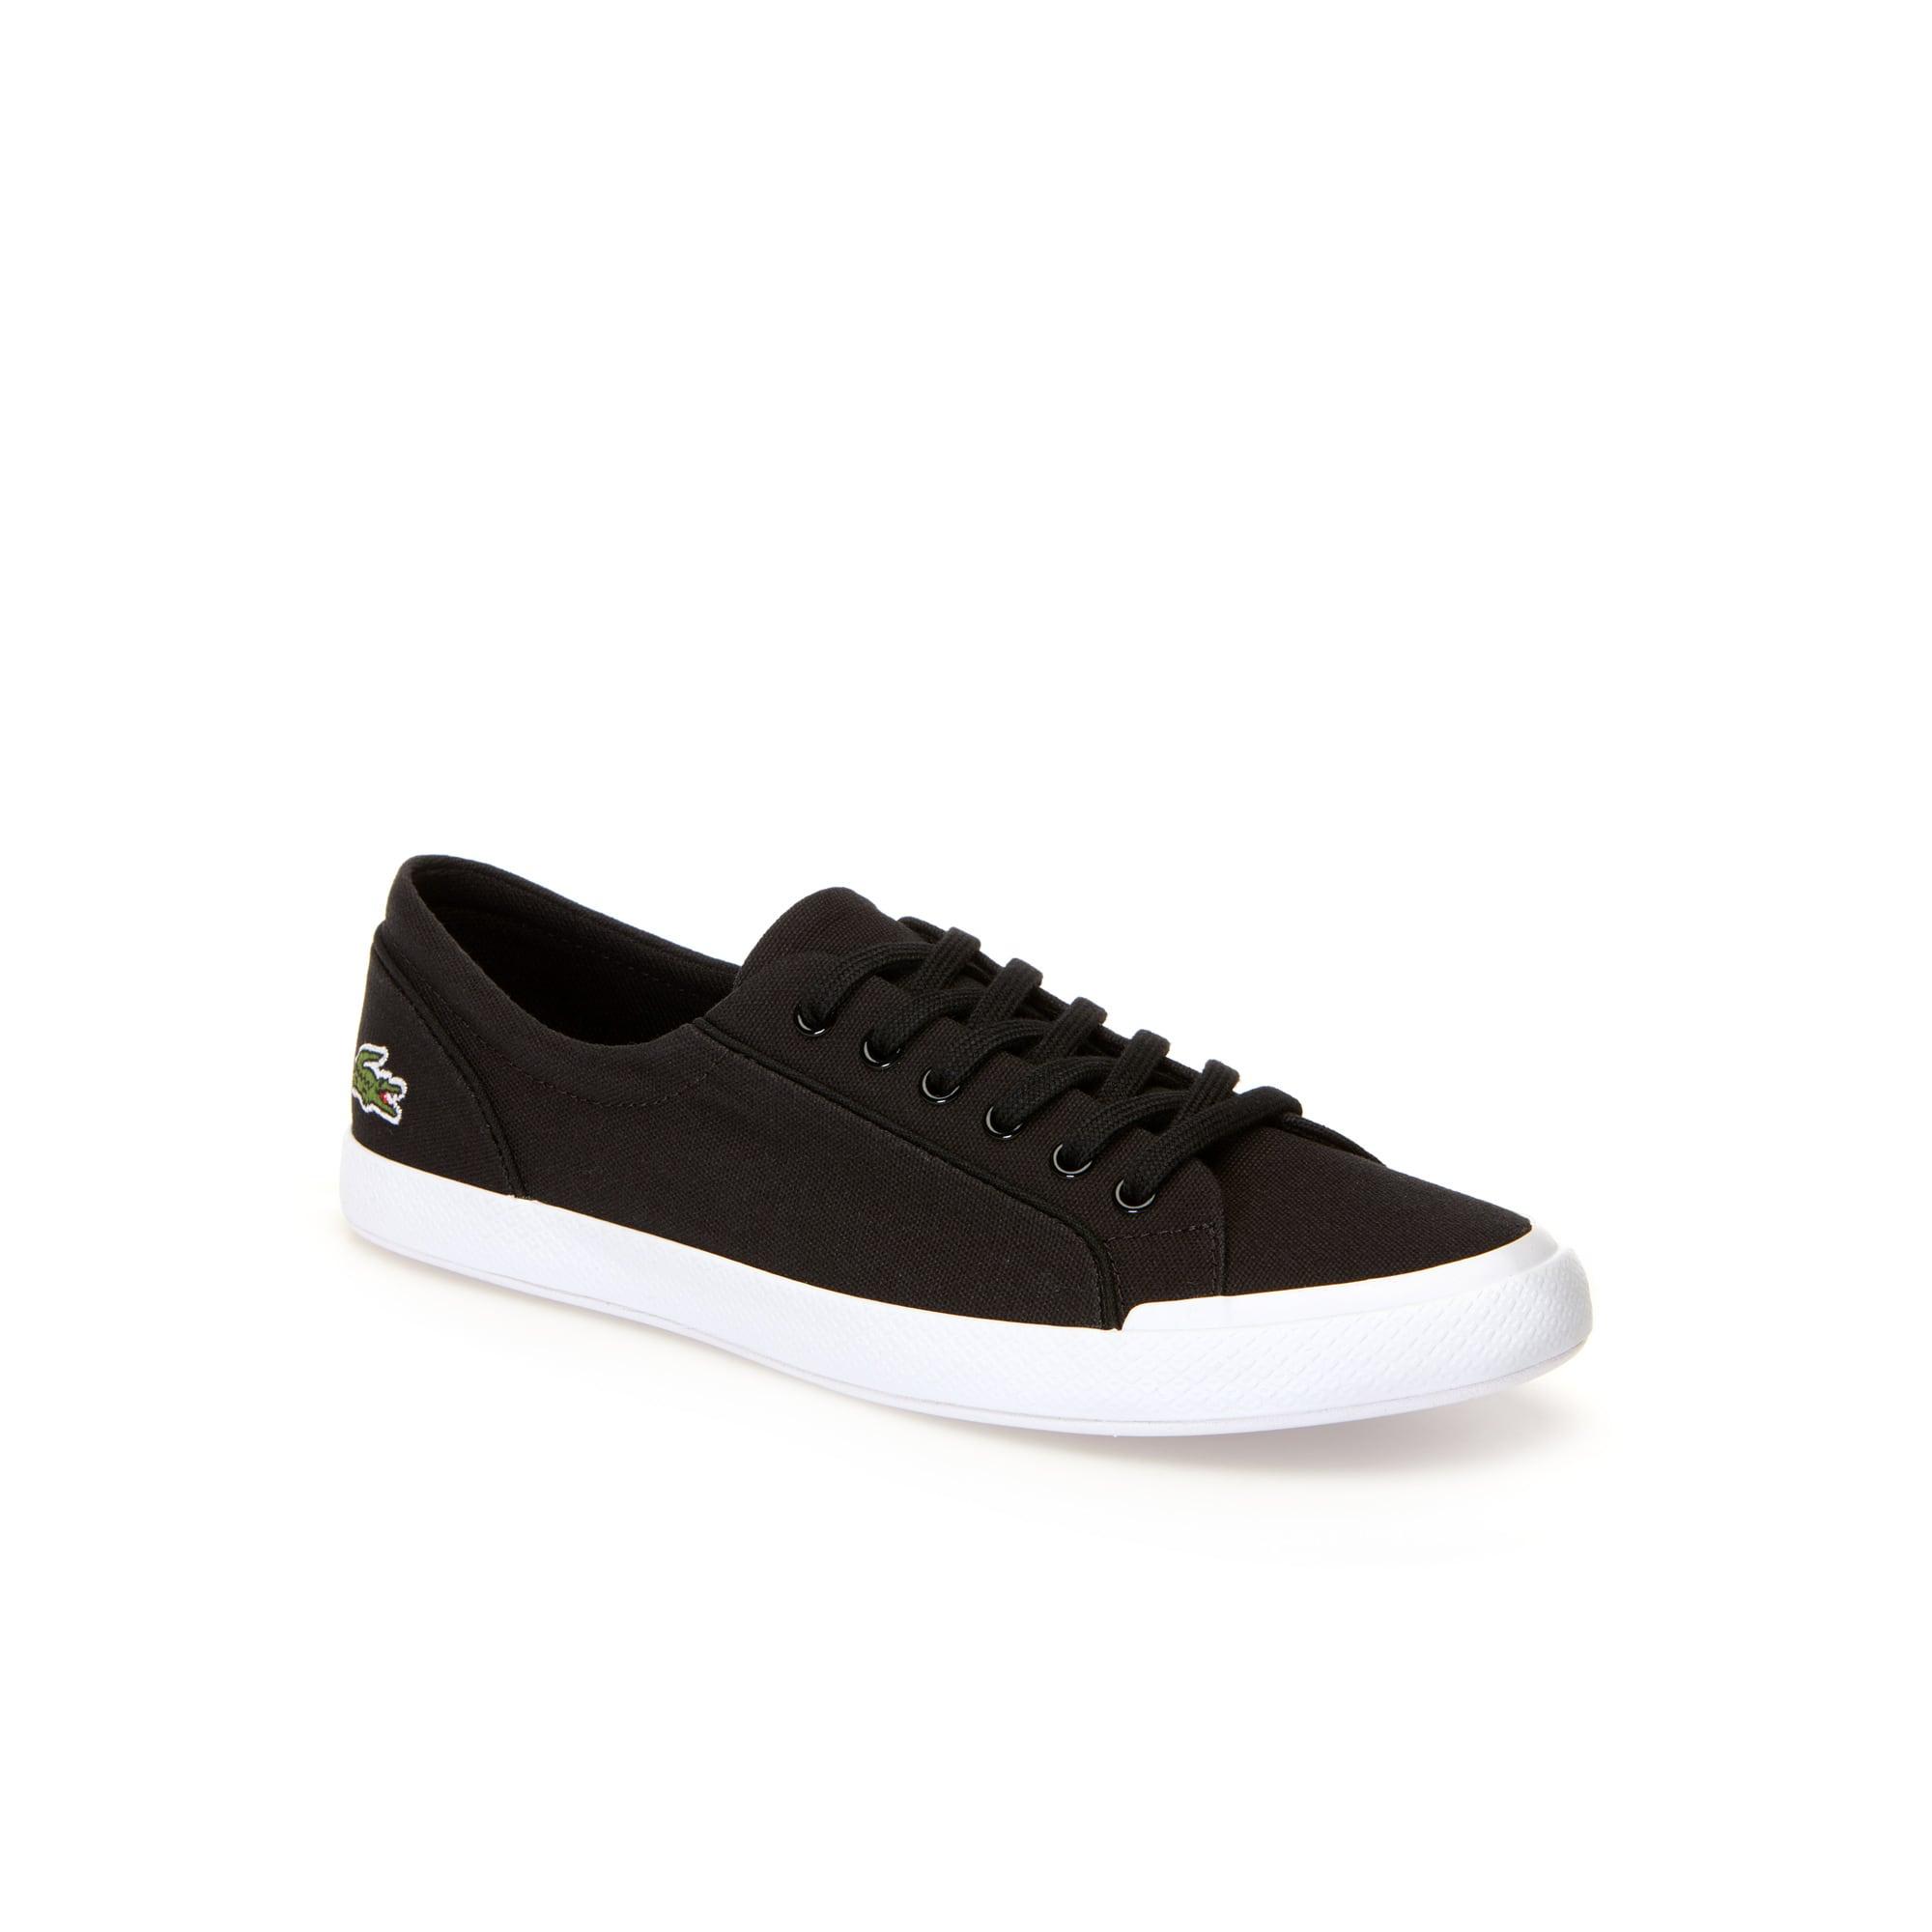 2653f1b46e648 Women s Lancelle BL Canvas Sneakers